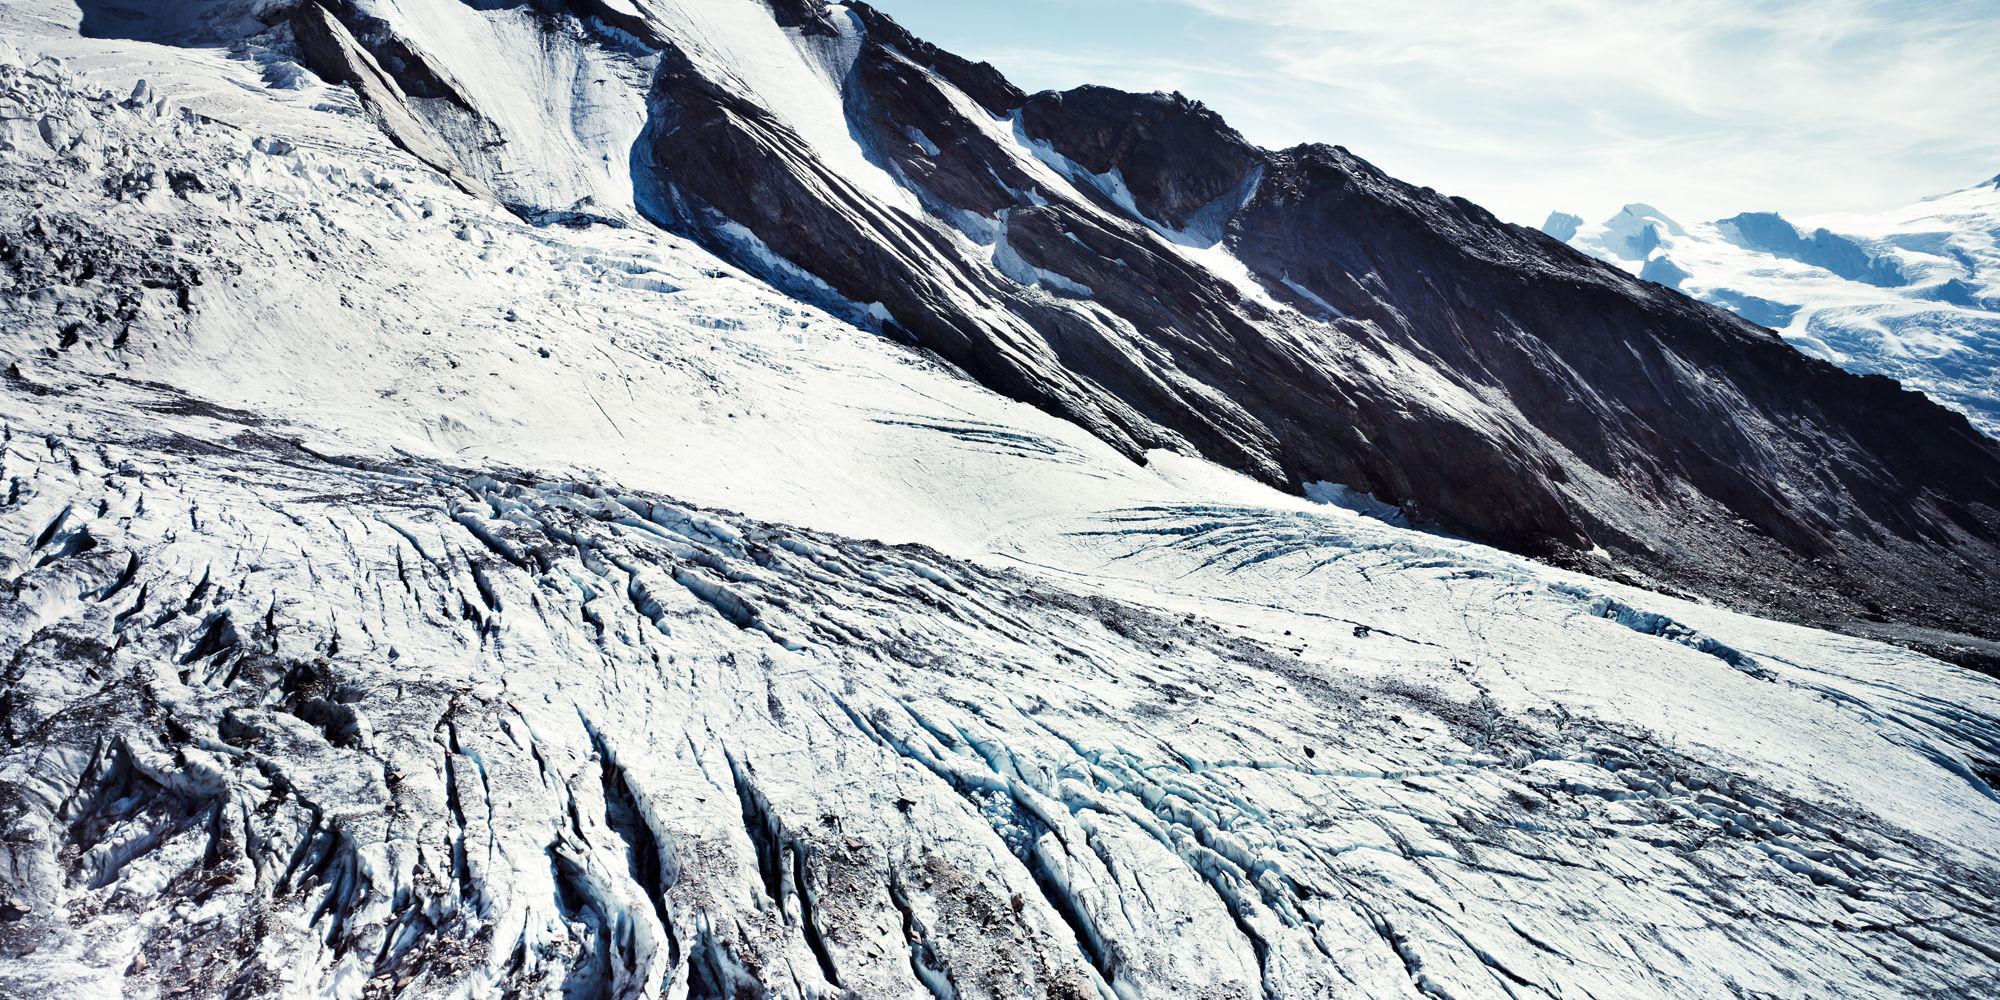 Gletscher Saas-Fee - Freie Ferienrepublik Saas-Fee